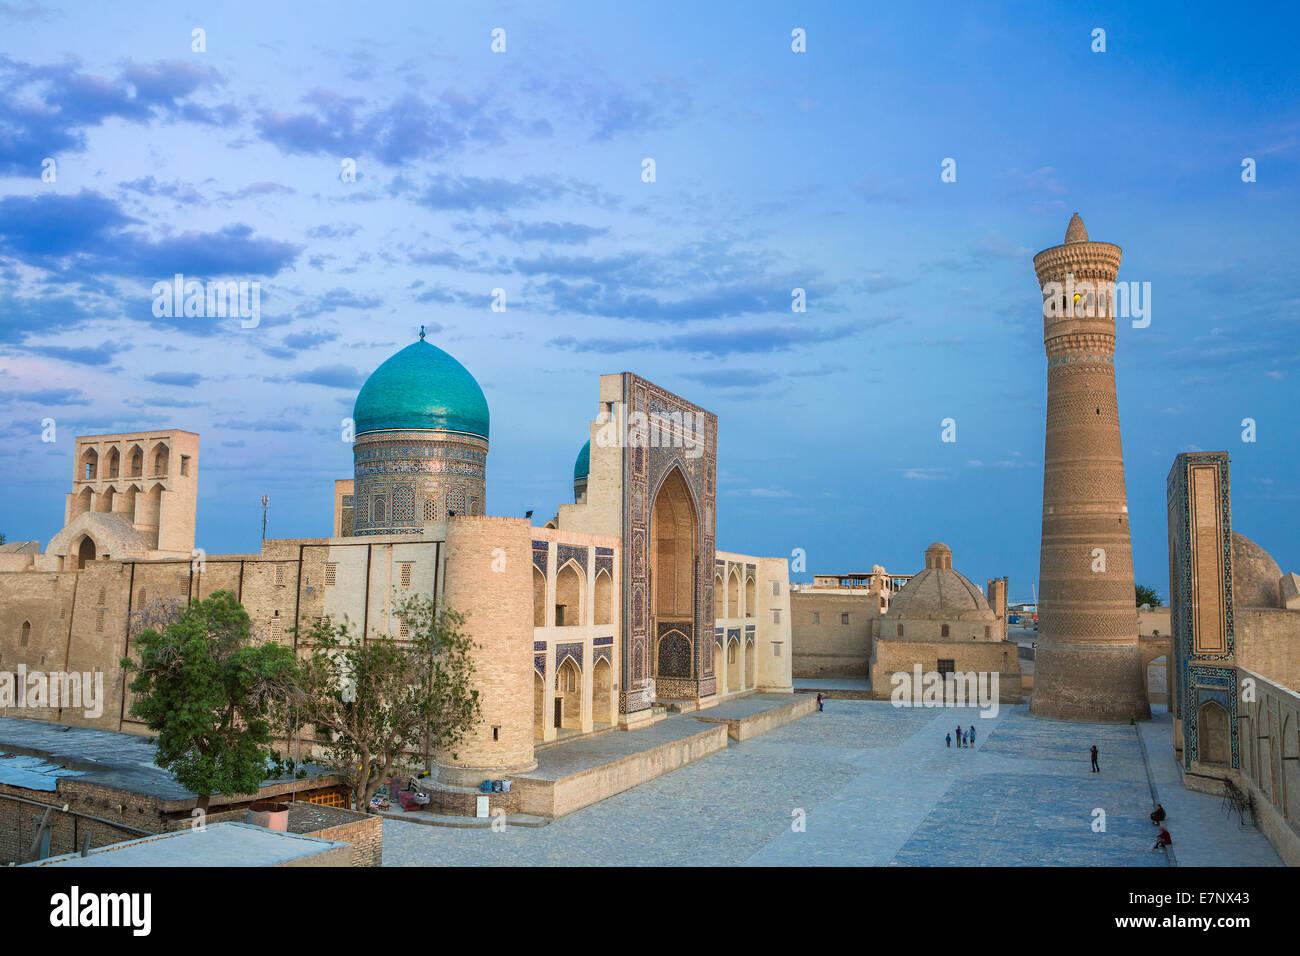 world heritage, Bukhara, Kalon, Medressah, Miri Arab, Uzbekistan, Central Asia, Asia, architecture, city, colourful, - Stock Image